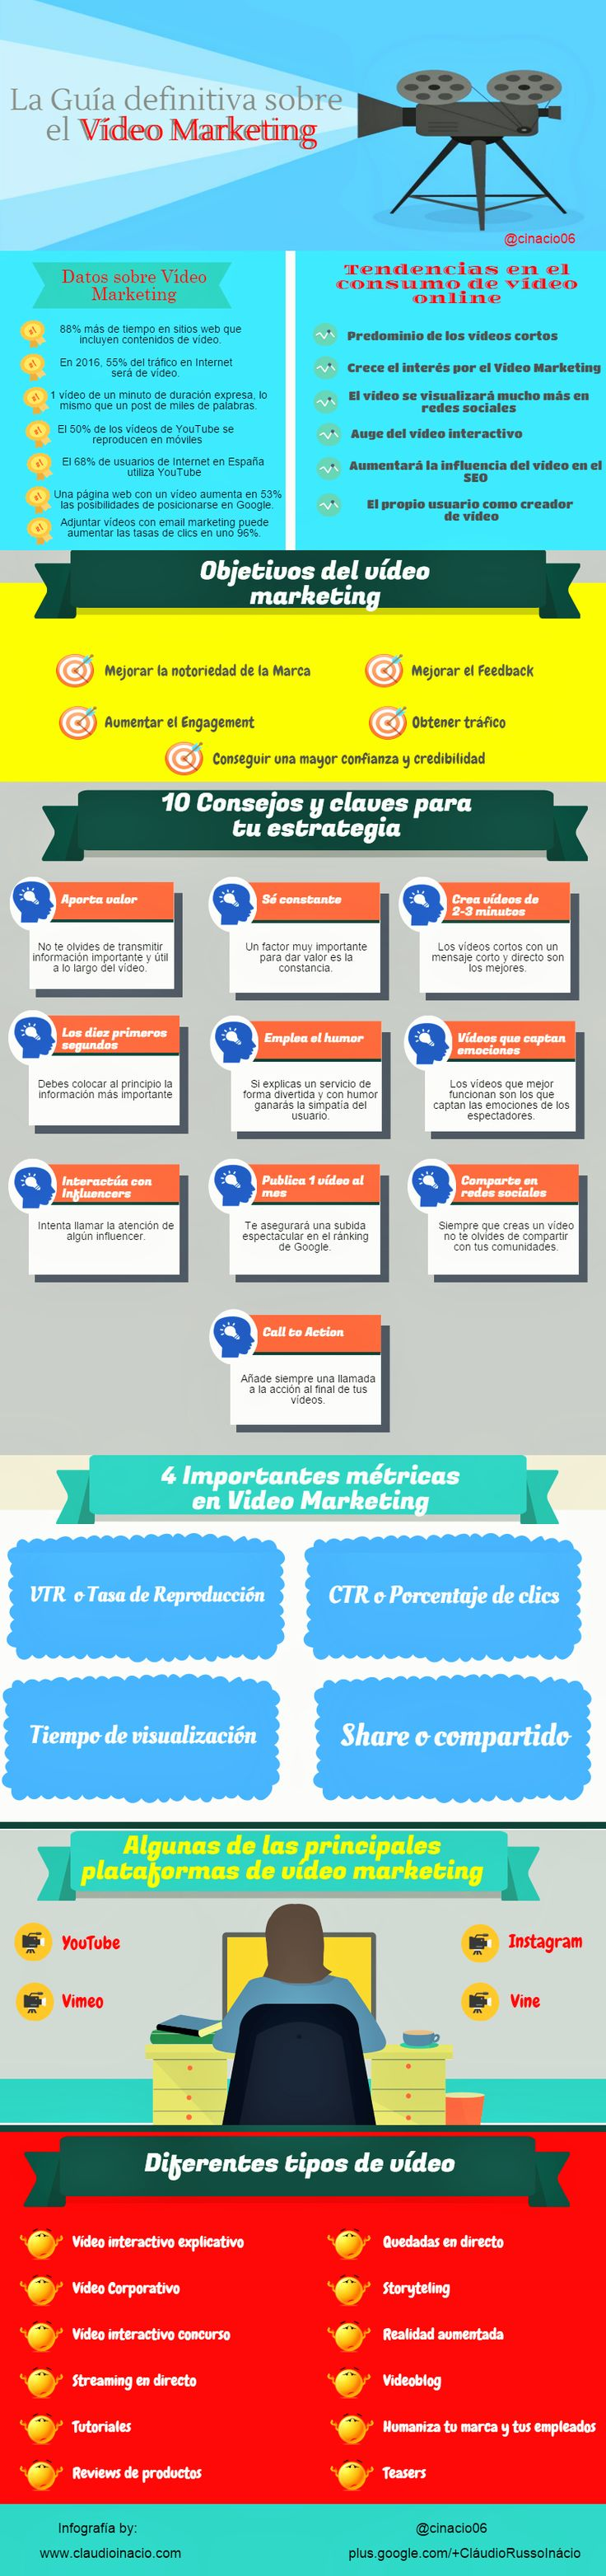 Guía definitiva de Vídeo Marketing #infografia #infographic #marketing